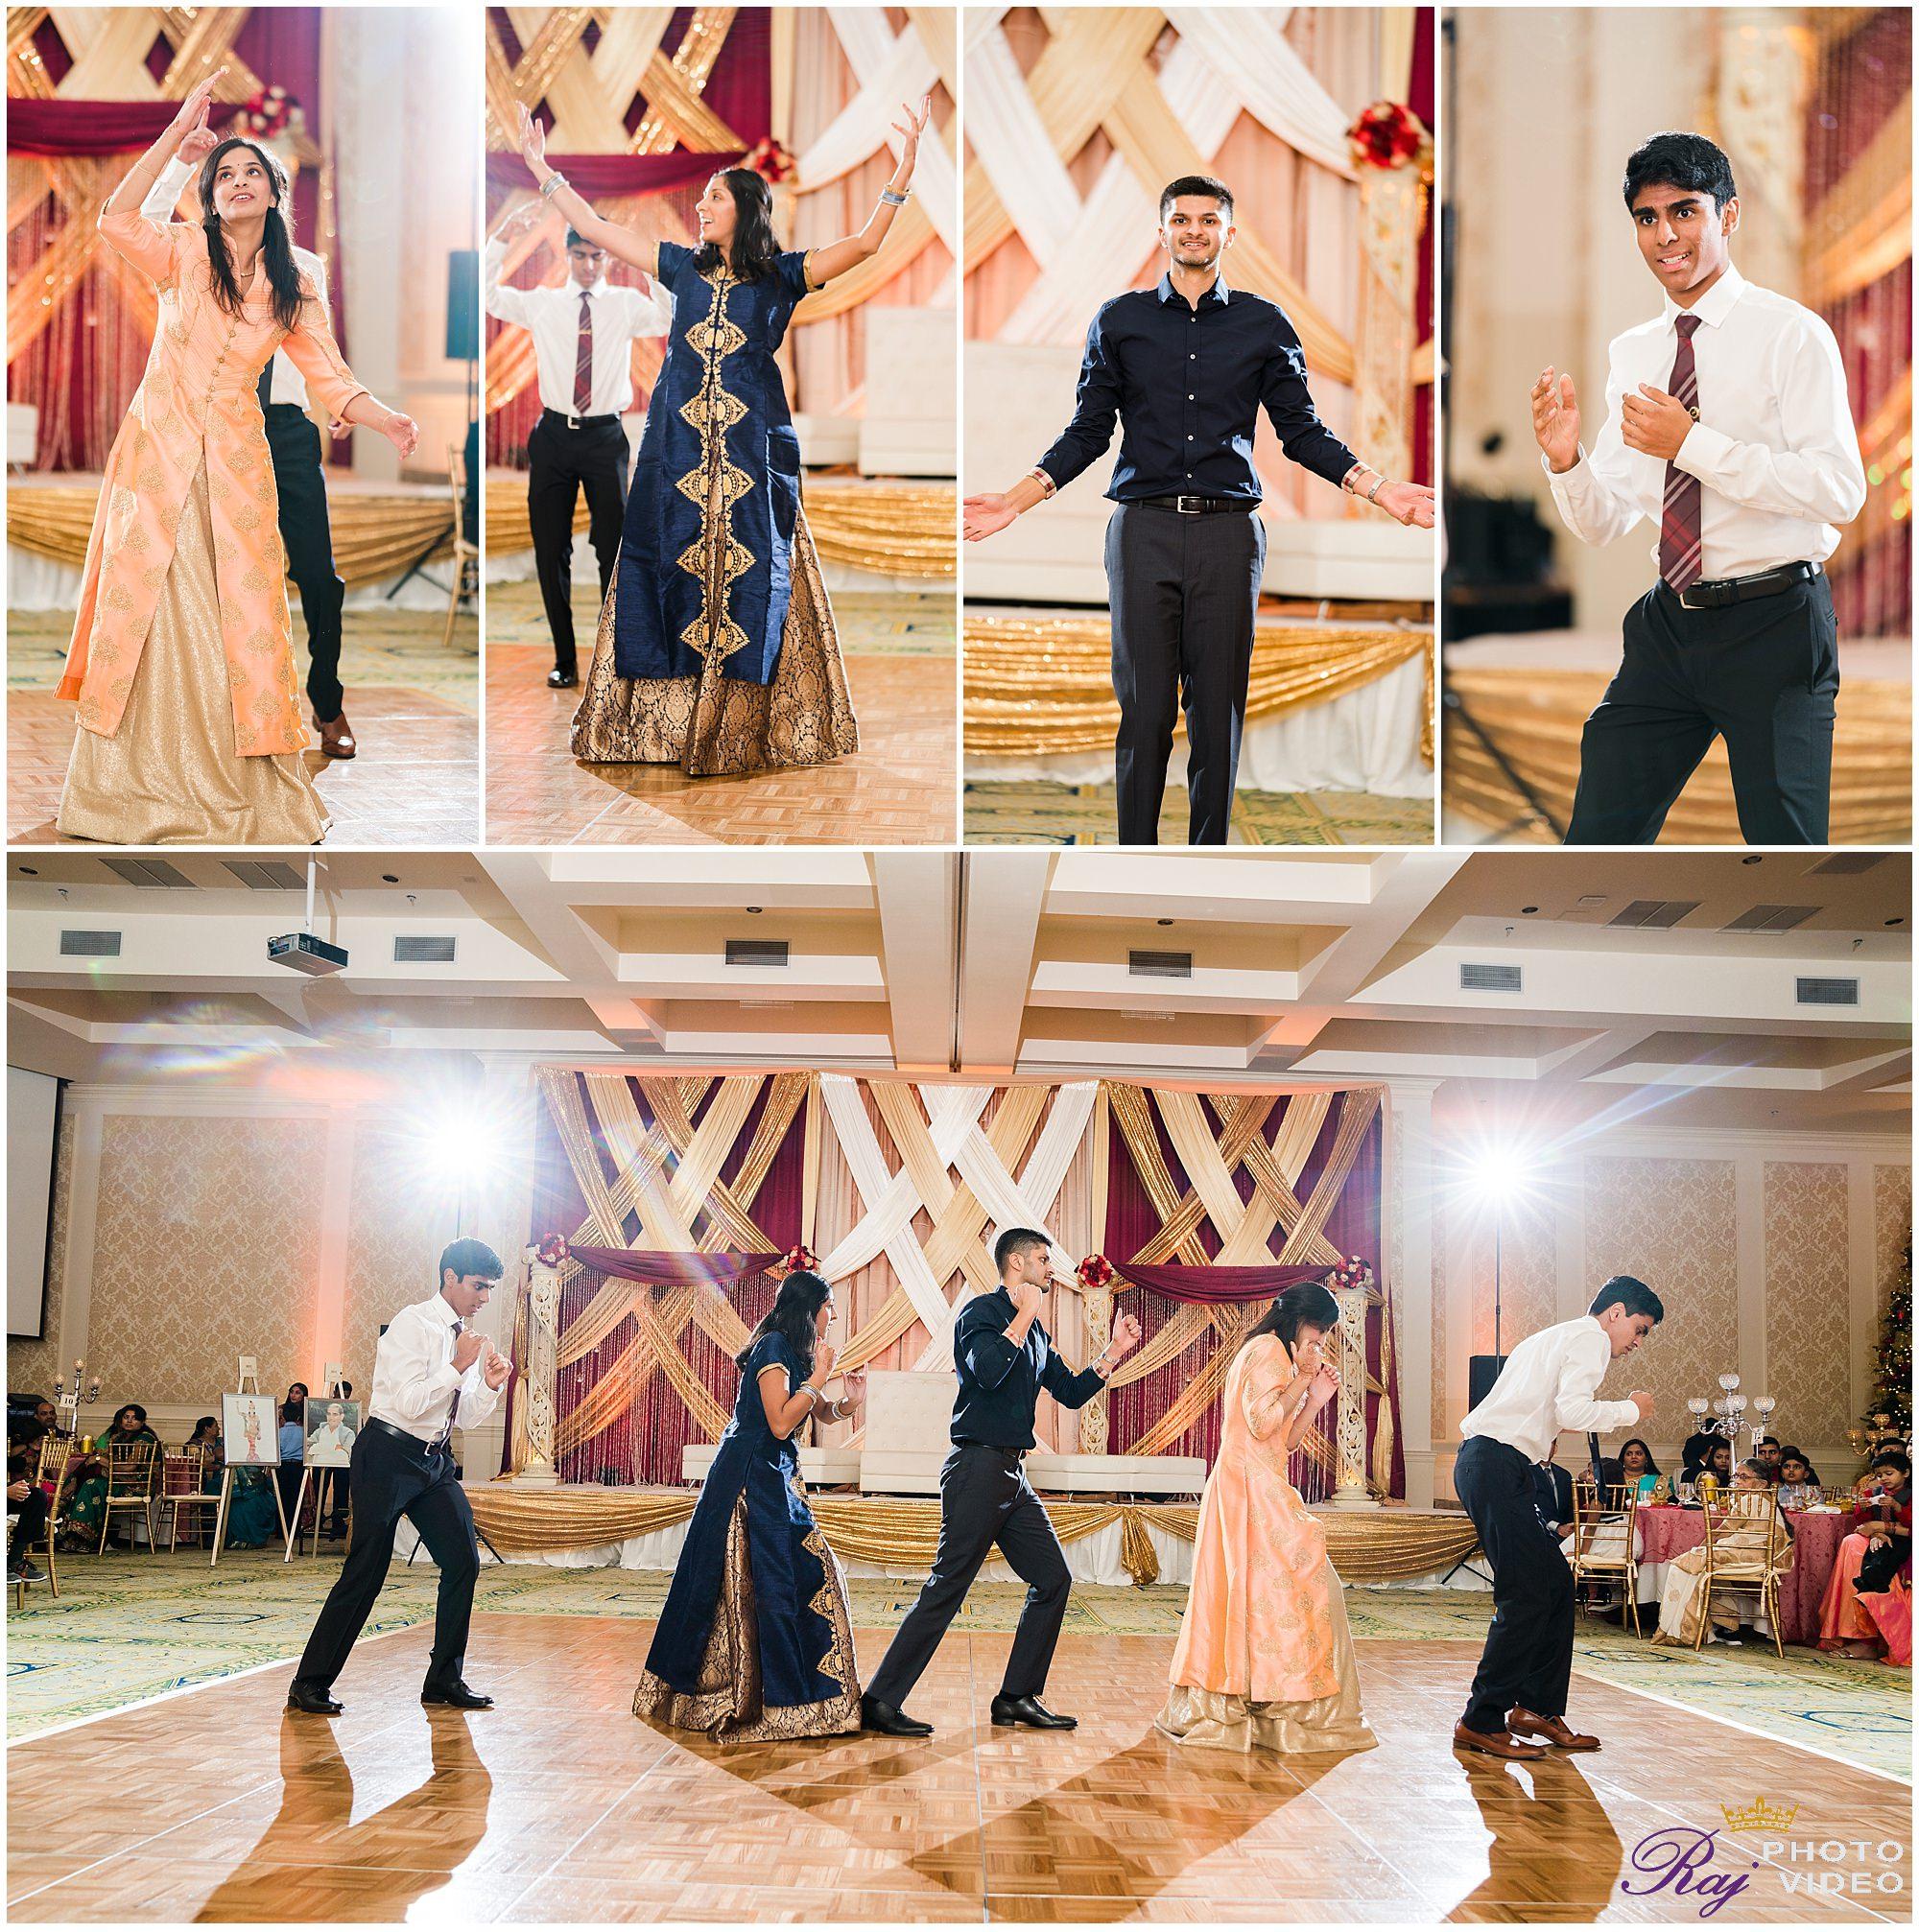 Founders-Inn-and-Spa-Virginia-Beach-VA-Indian-Wedding-Harini-Vivek-77.jpg